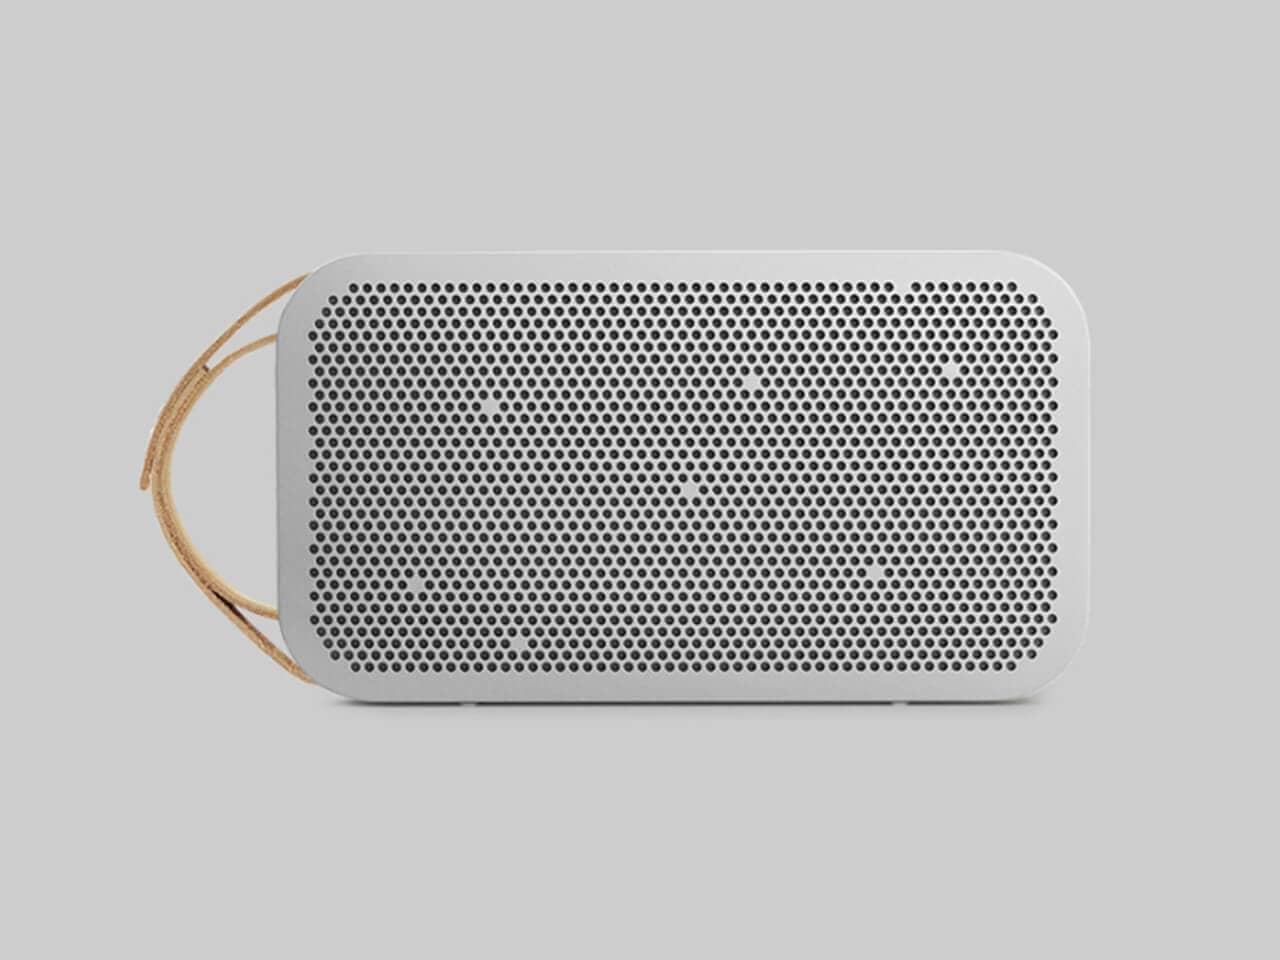 Luxury Stocking Fillers - bluetooth speaker